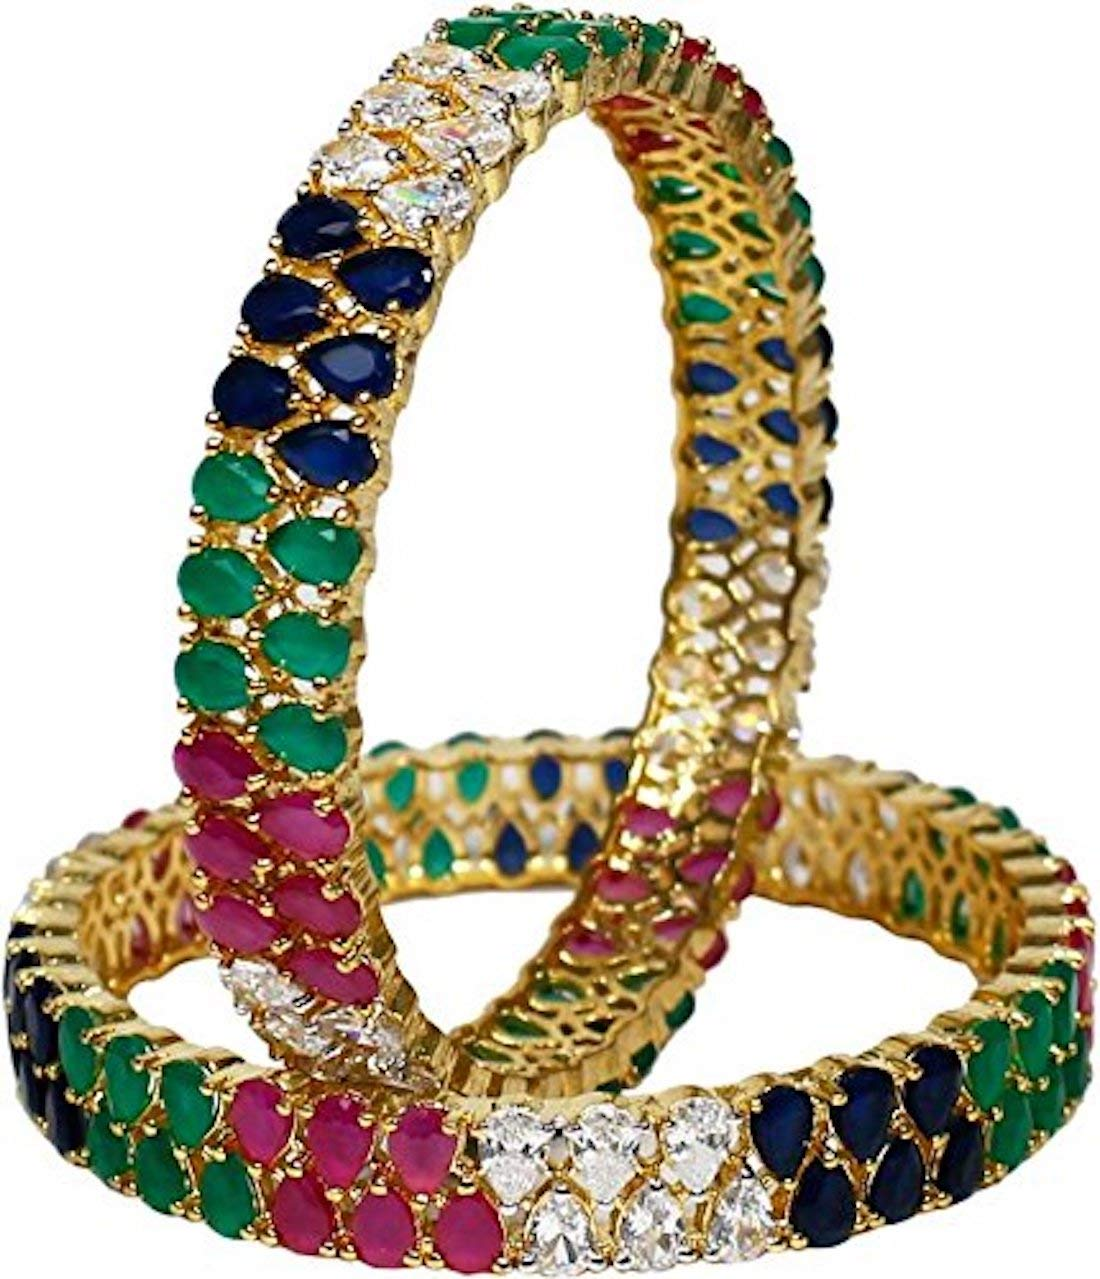 RATNAVALI JEWELS CZ Zirconia Gold Tone Multi color Diamond Elegant Bollywood Indian Bangles Jewelry Women (2.11)